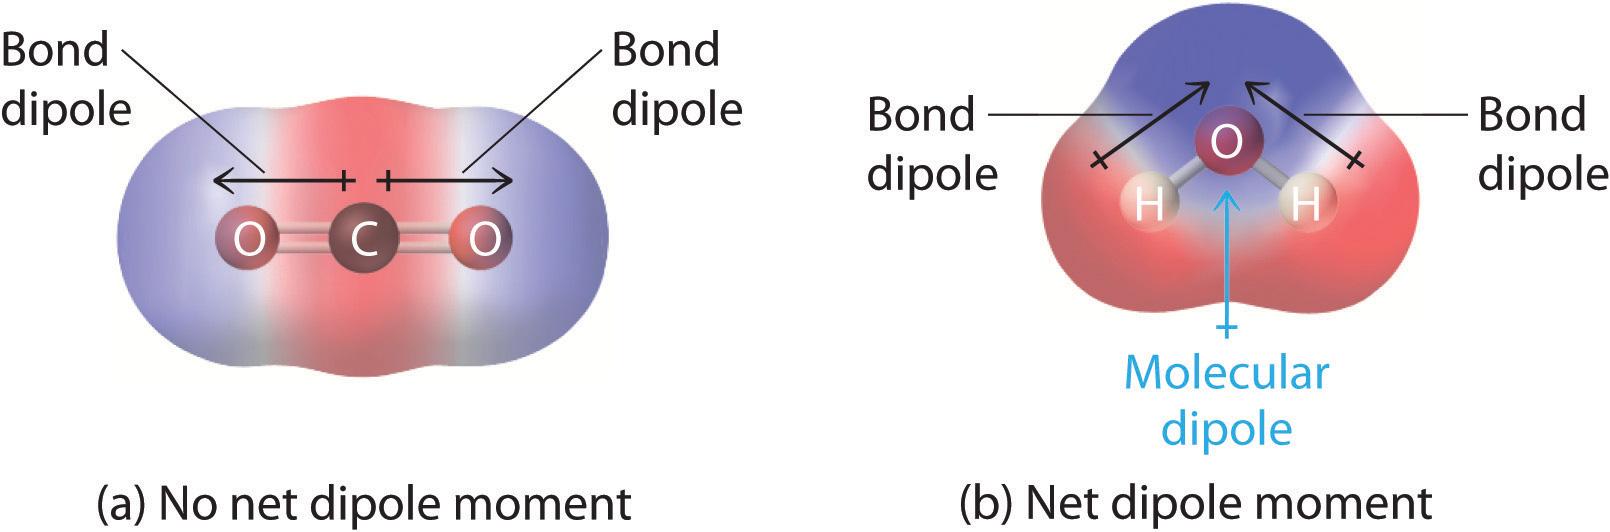 Predicting the Geometr... Nonpolar Covalent Bond Examples